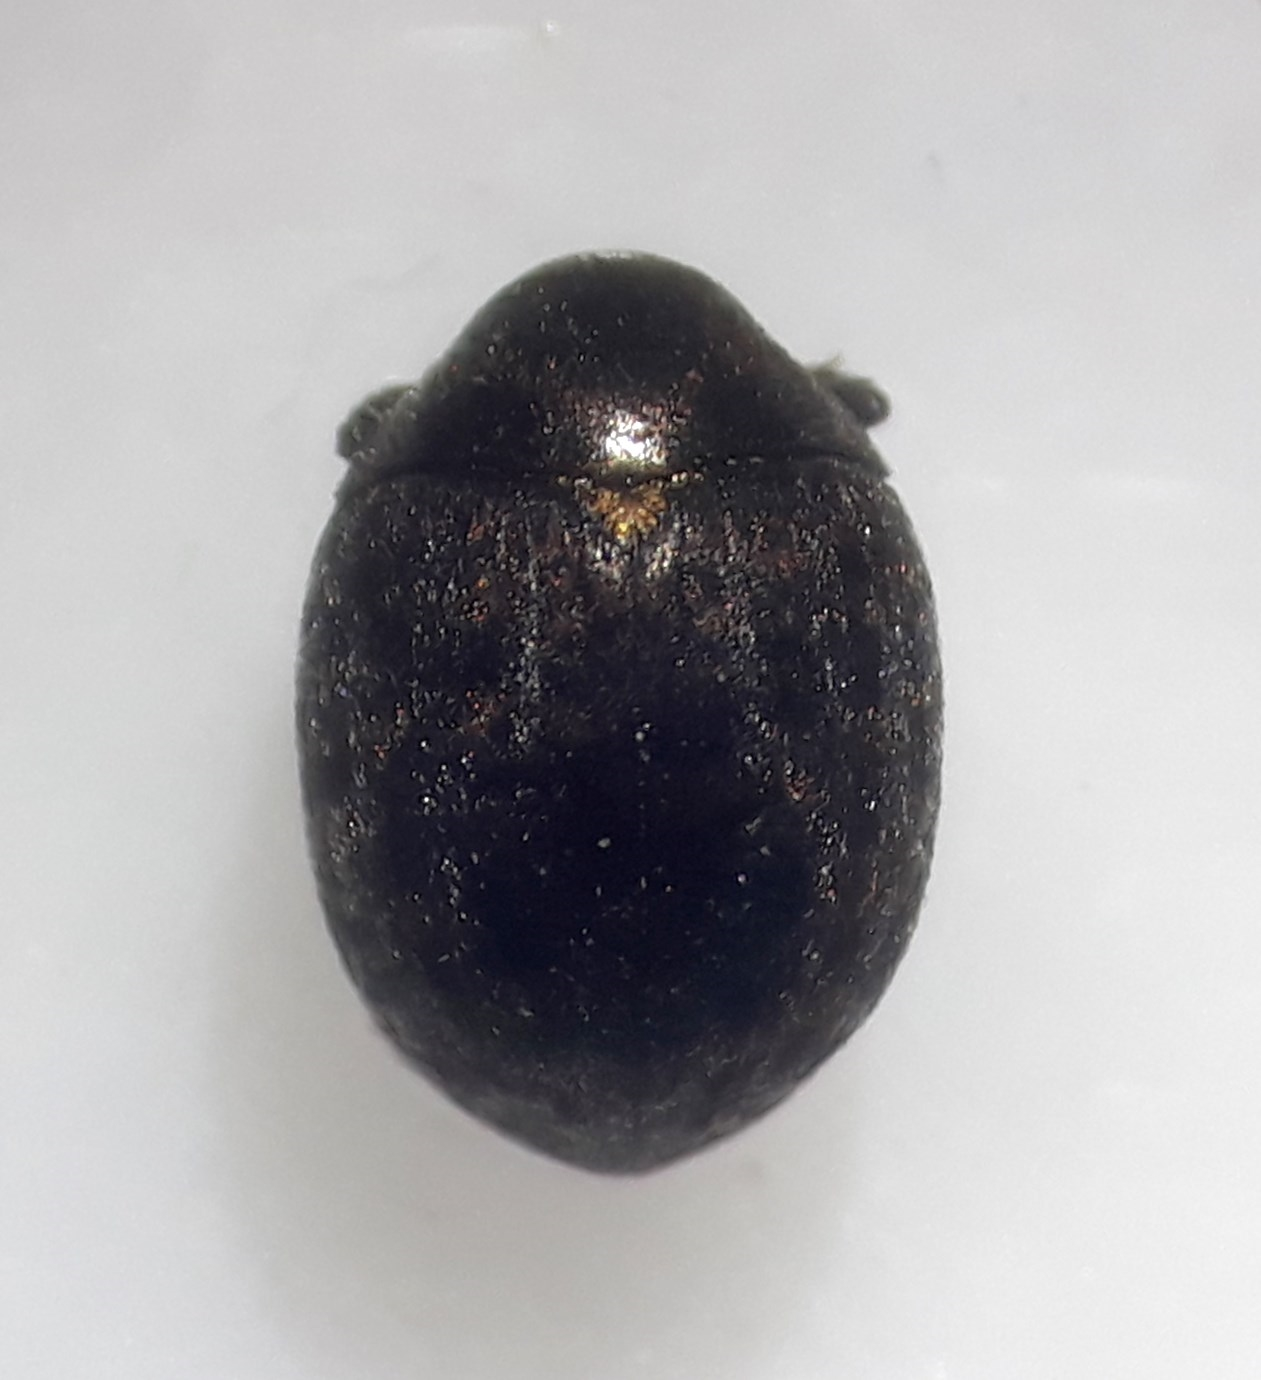 Cytilus auricomus